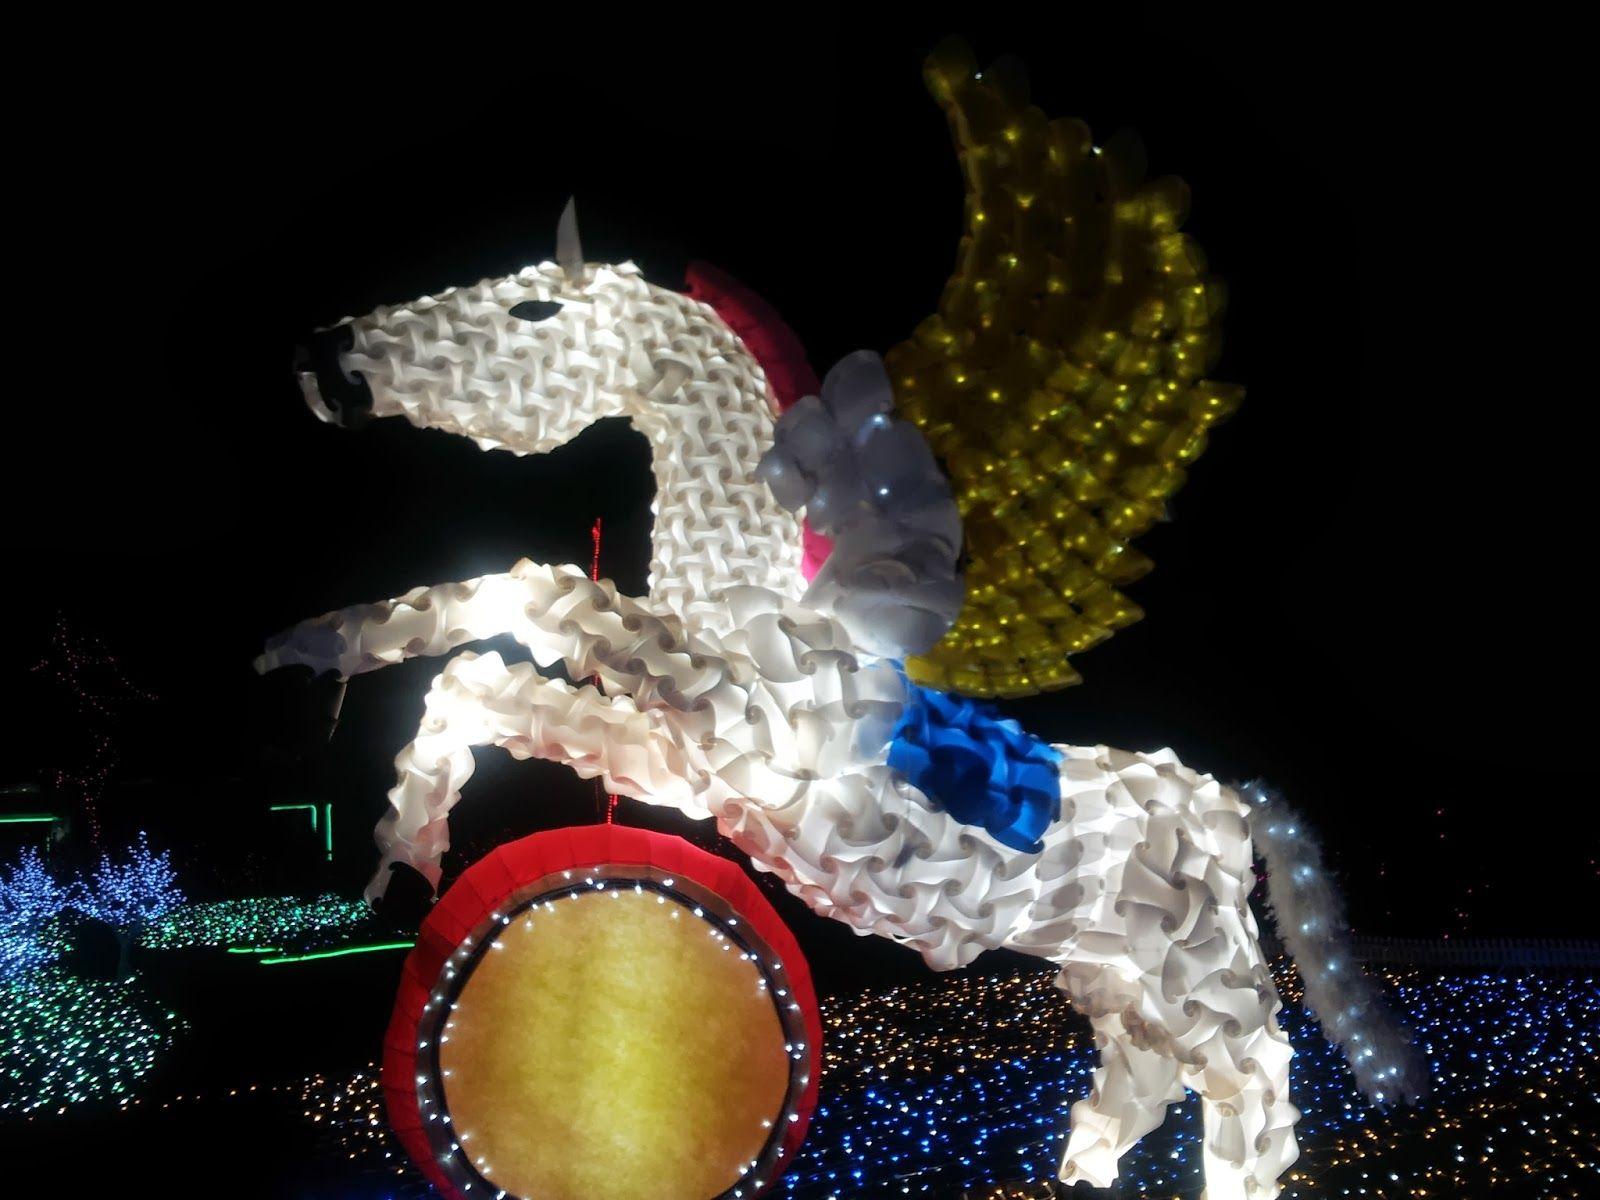 Vlightdeco Iq Light Puzzle Pendant Jigsaw Lamp Styles Cool Art Projects Christmas Ornaments Holiday Decor